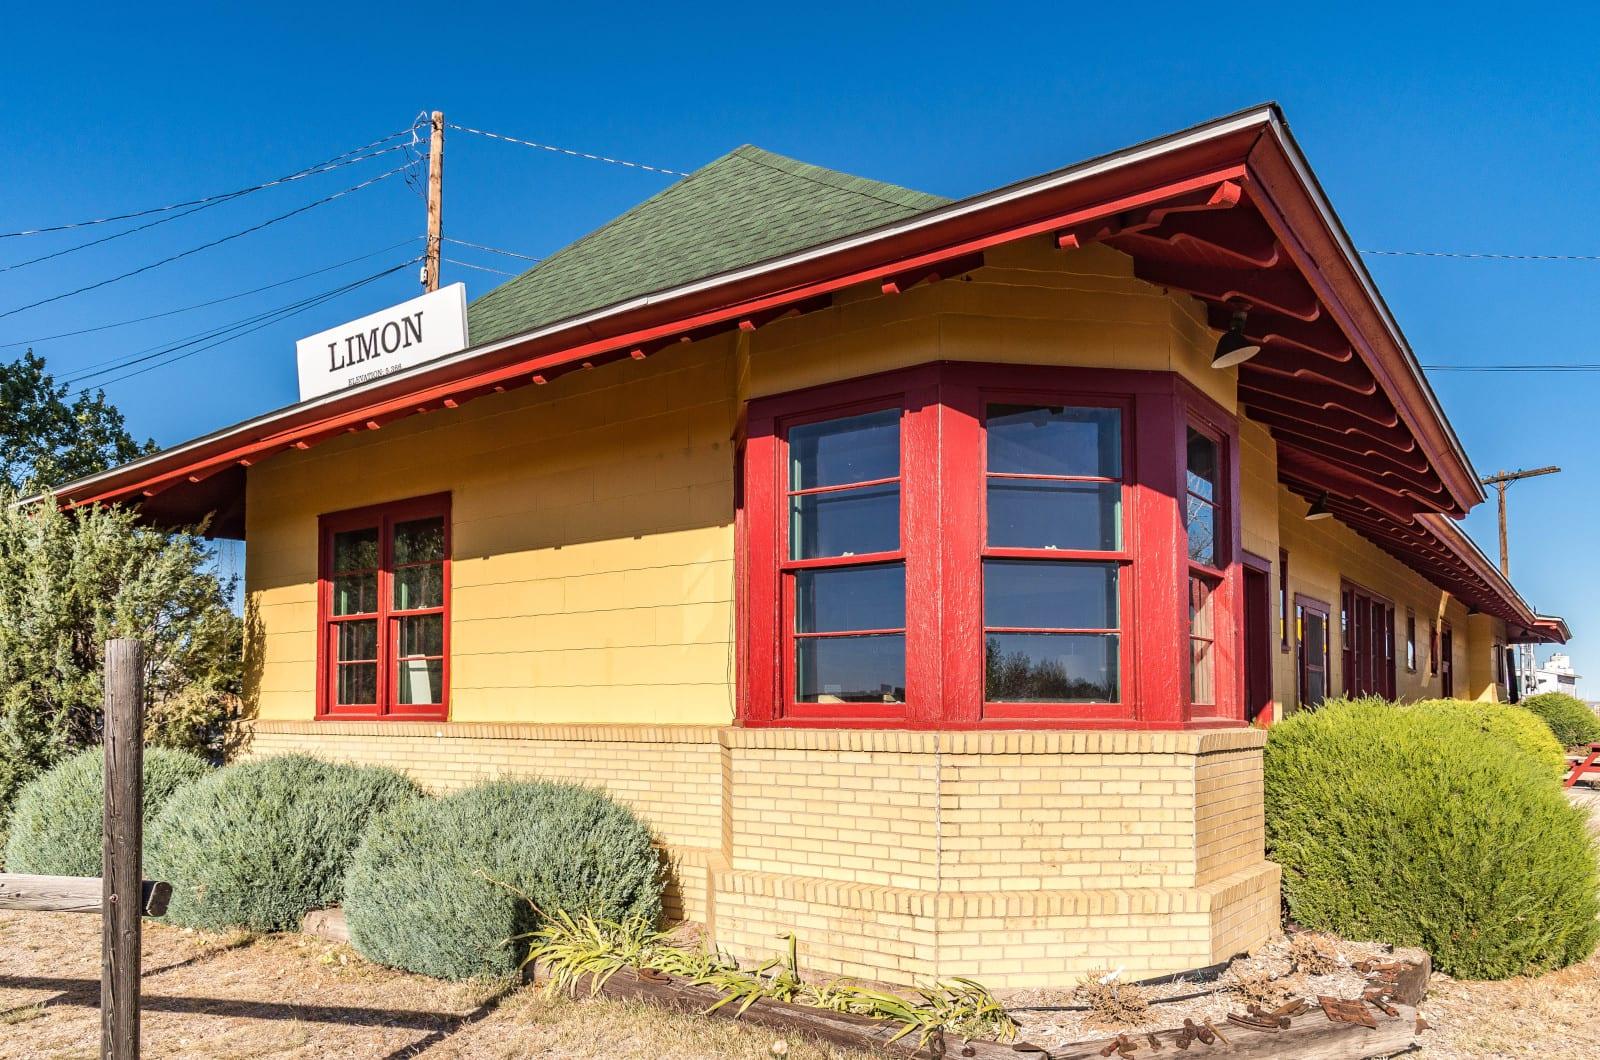 Limon CO Railroad Train Depot